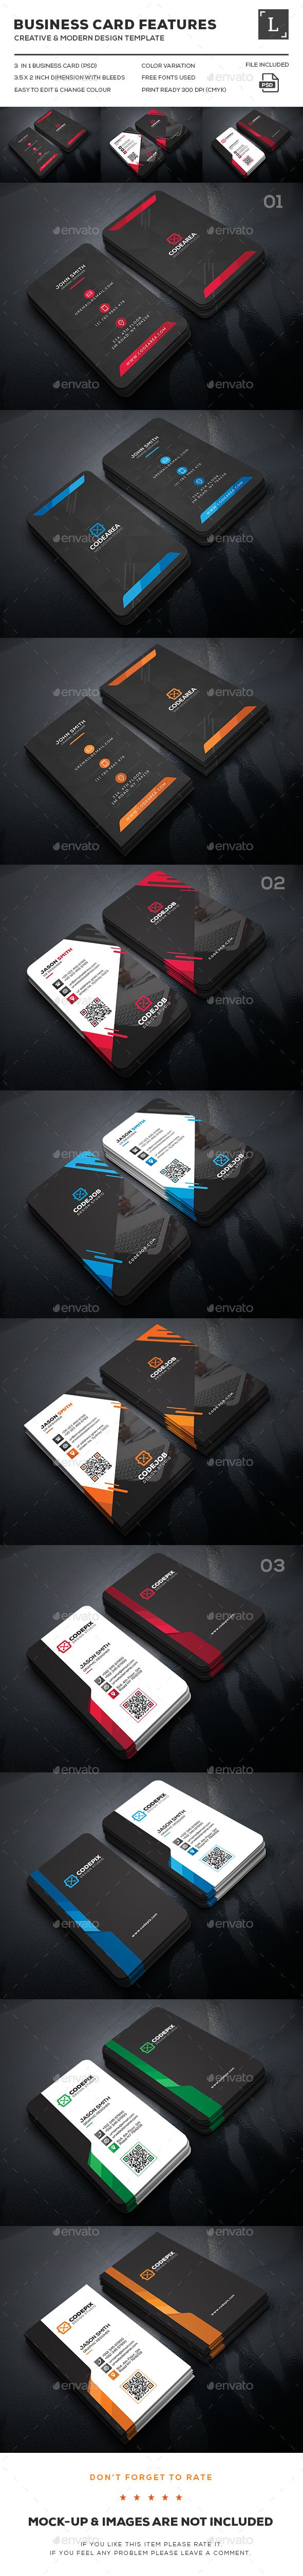 Dark business card bundle pinterest cartes de dark business card bundle templates psd download here reheart Images